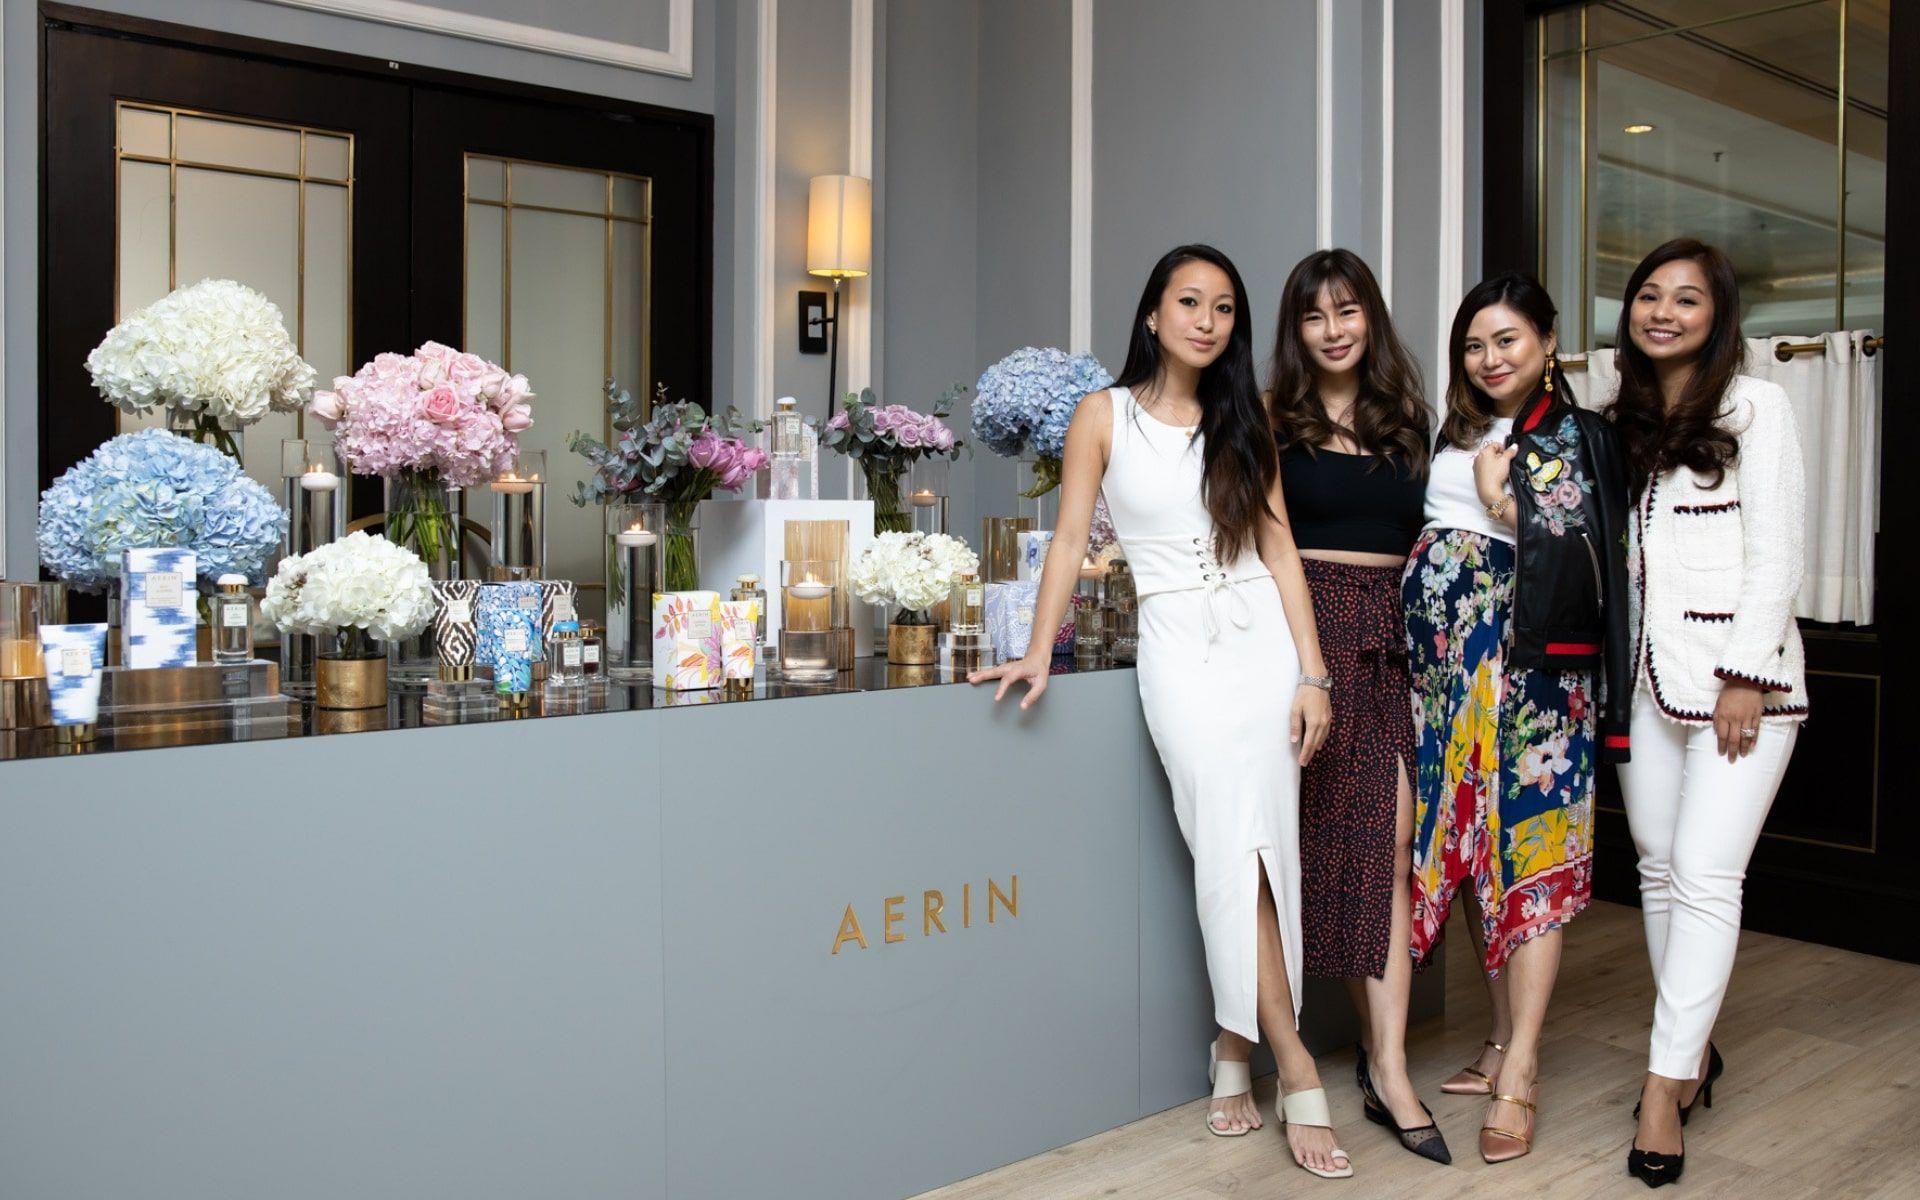 Rebekah Yeoh, Datin Dian Lee, Jenn Low and Datin Nina Ismail Sabri